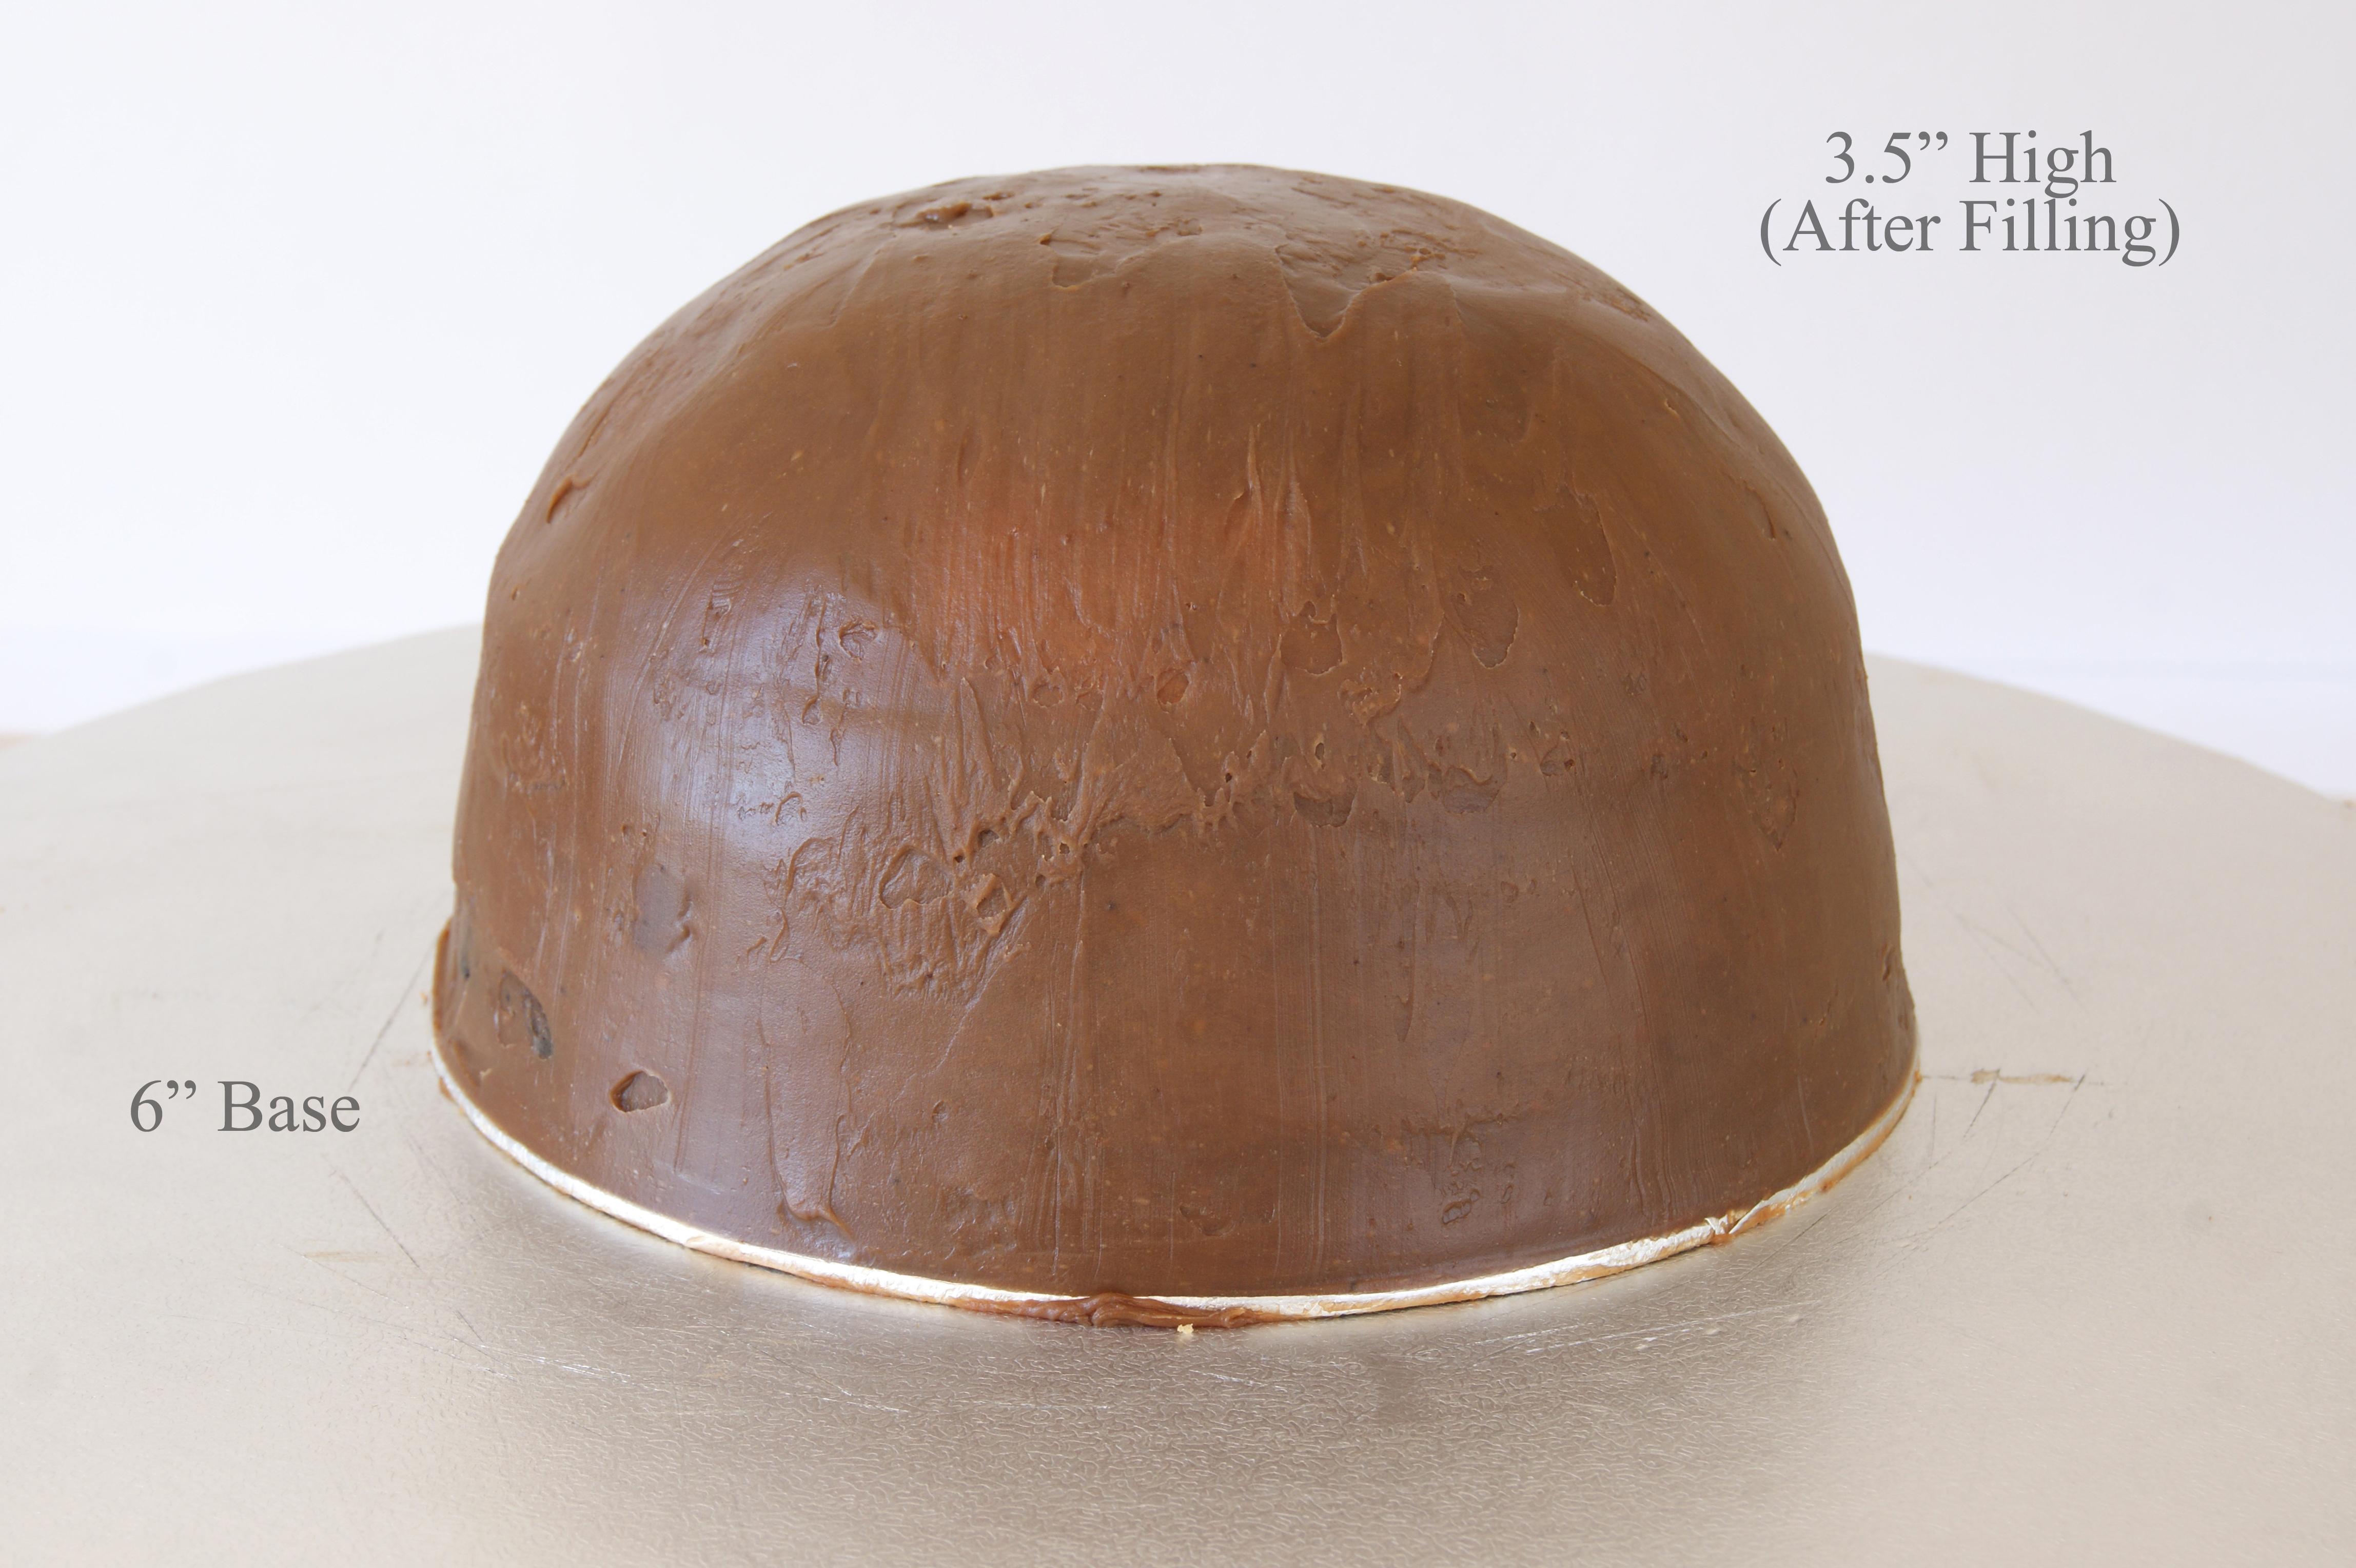 Giant-Ice-Cream-18.jpg#asset:19071